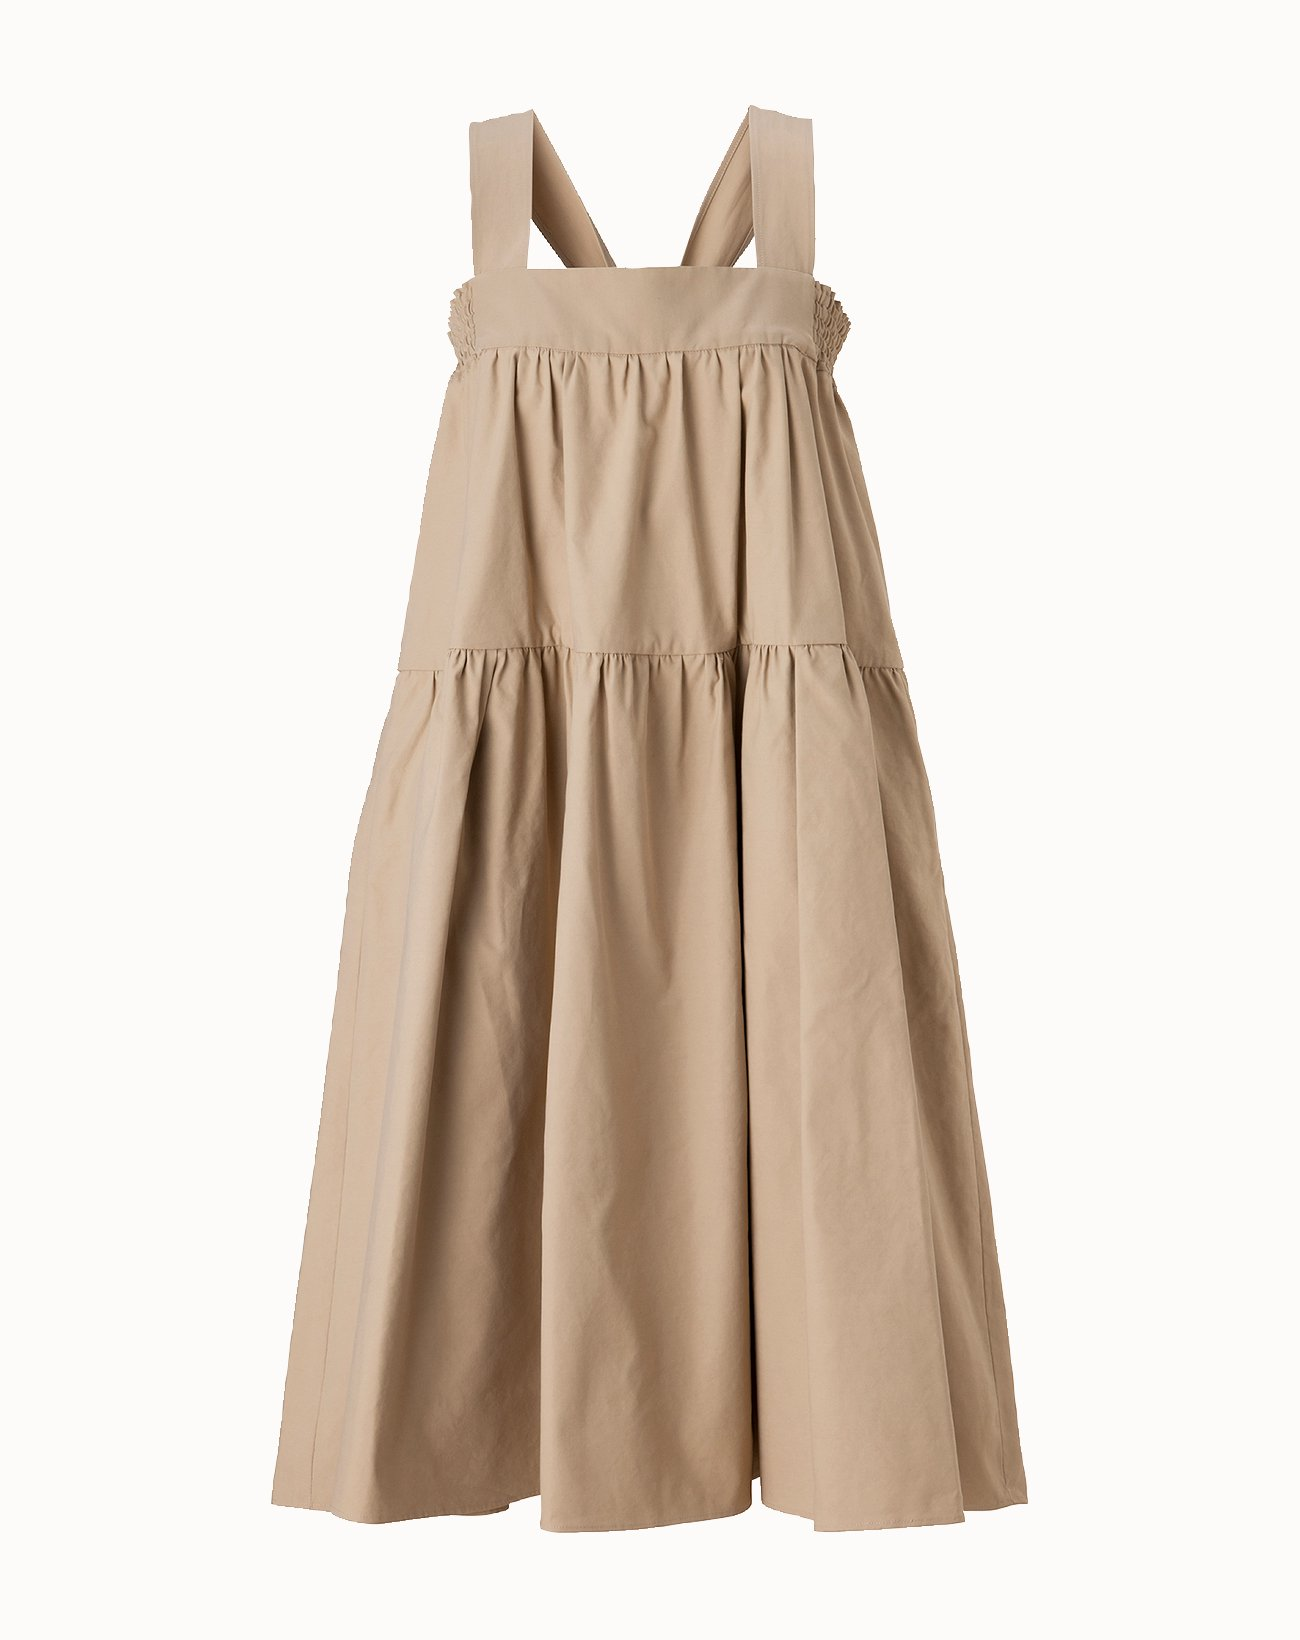 Vintage Twill Dress - Beige